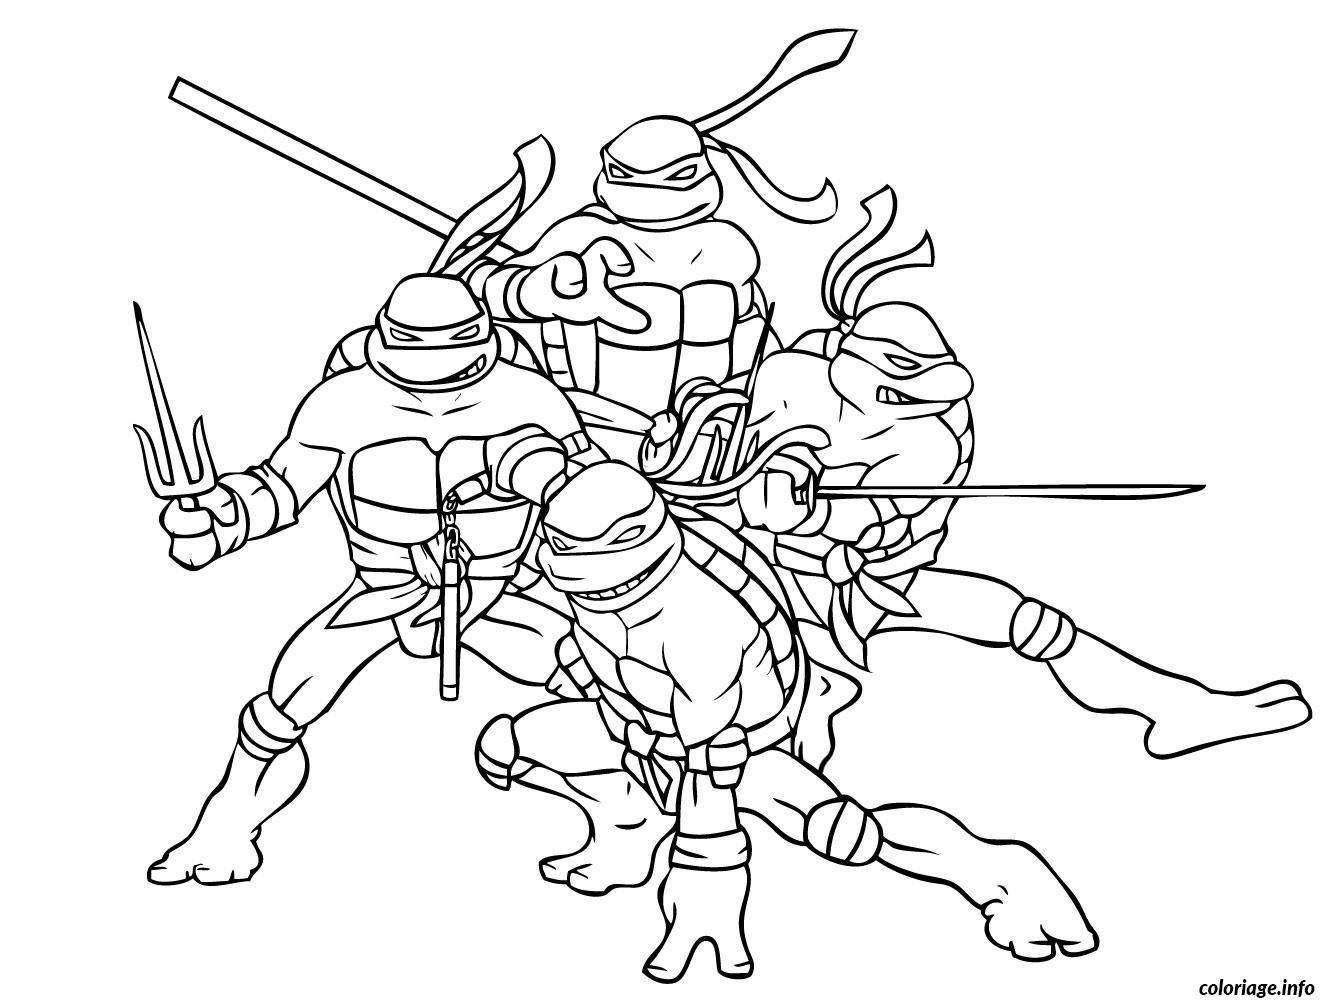 Coloriage Tortue Ninja 6 Dessin A Imprimer Coloriage Tortue